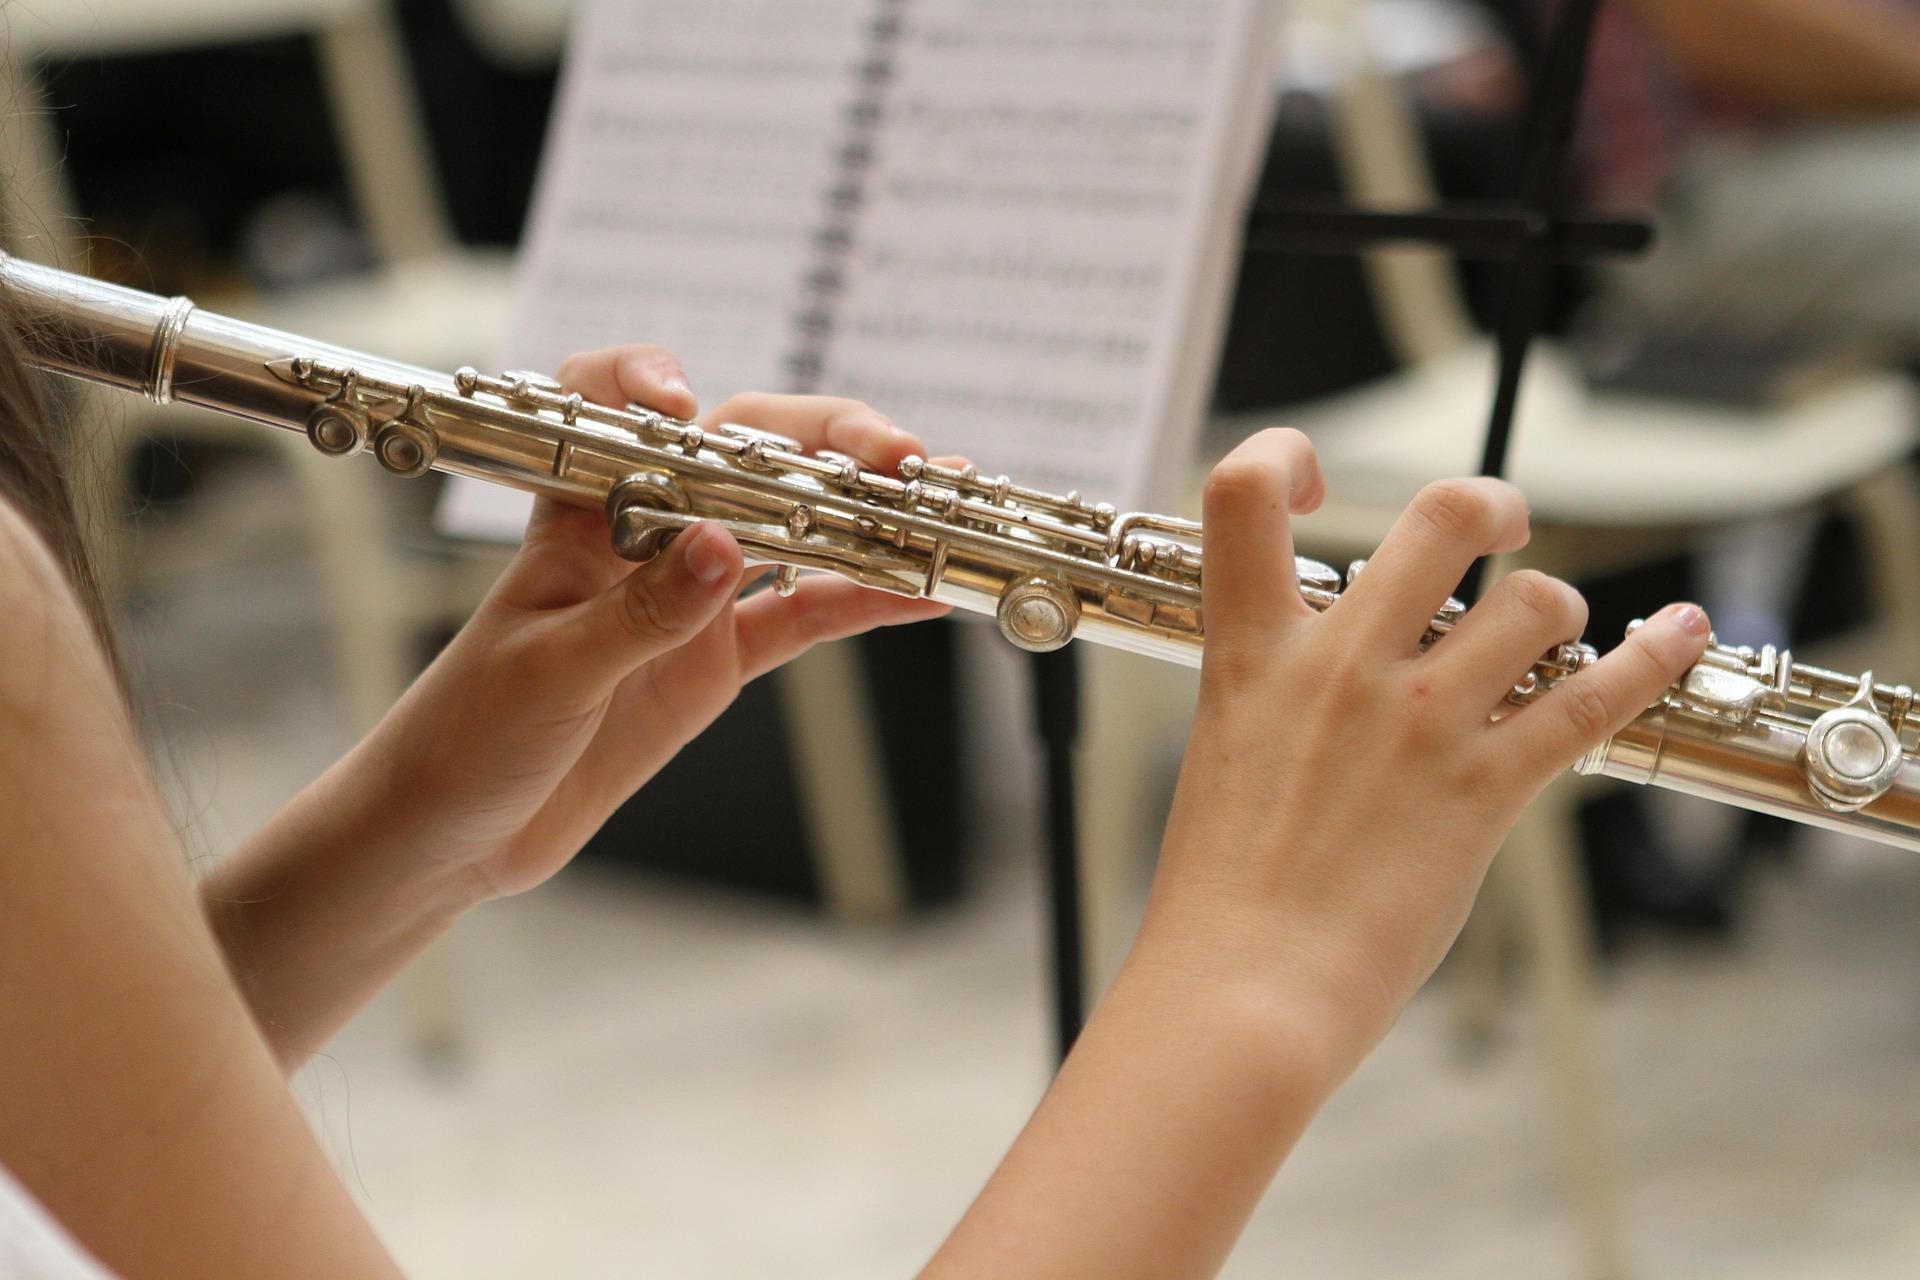 Das Angebot an privaten Musikschulen in Prenzlauer Berg ist groß. (Foto: Pixabay, CCO Public Domain)